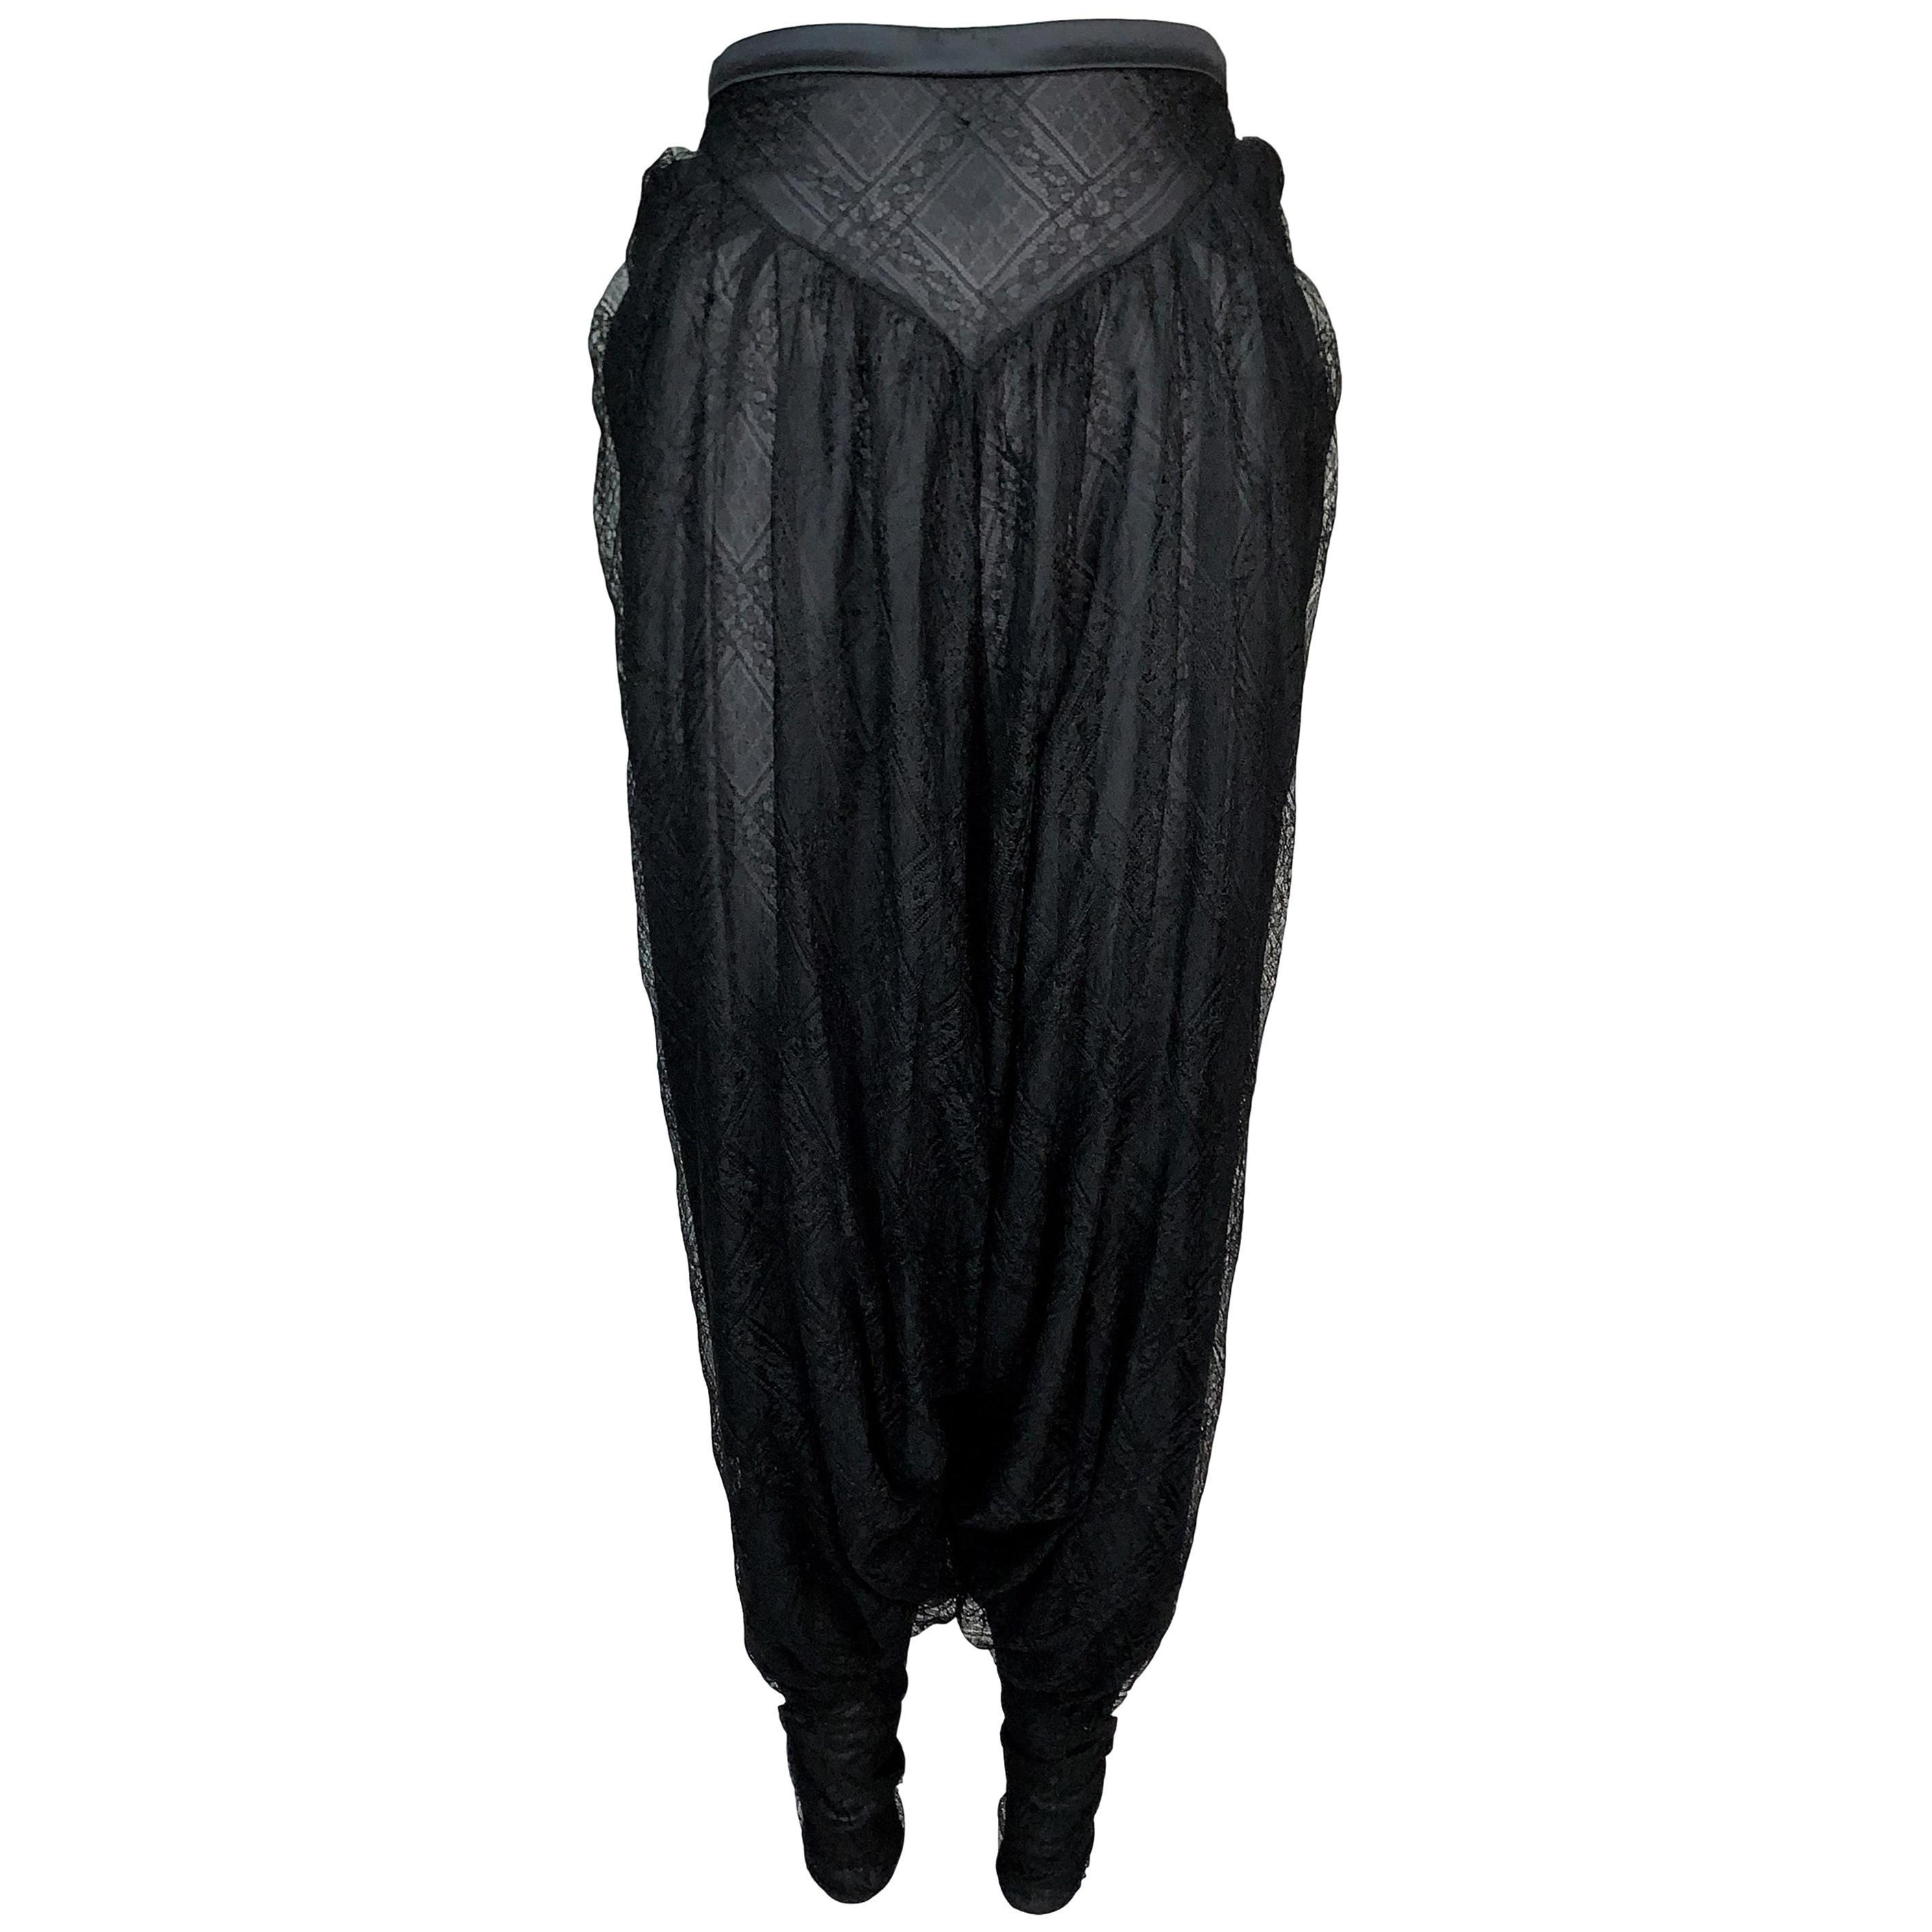 S/S 2002 Christian Dior by John Galliano Sheer Black Lace Harem Pants